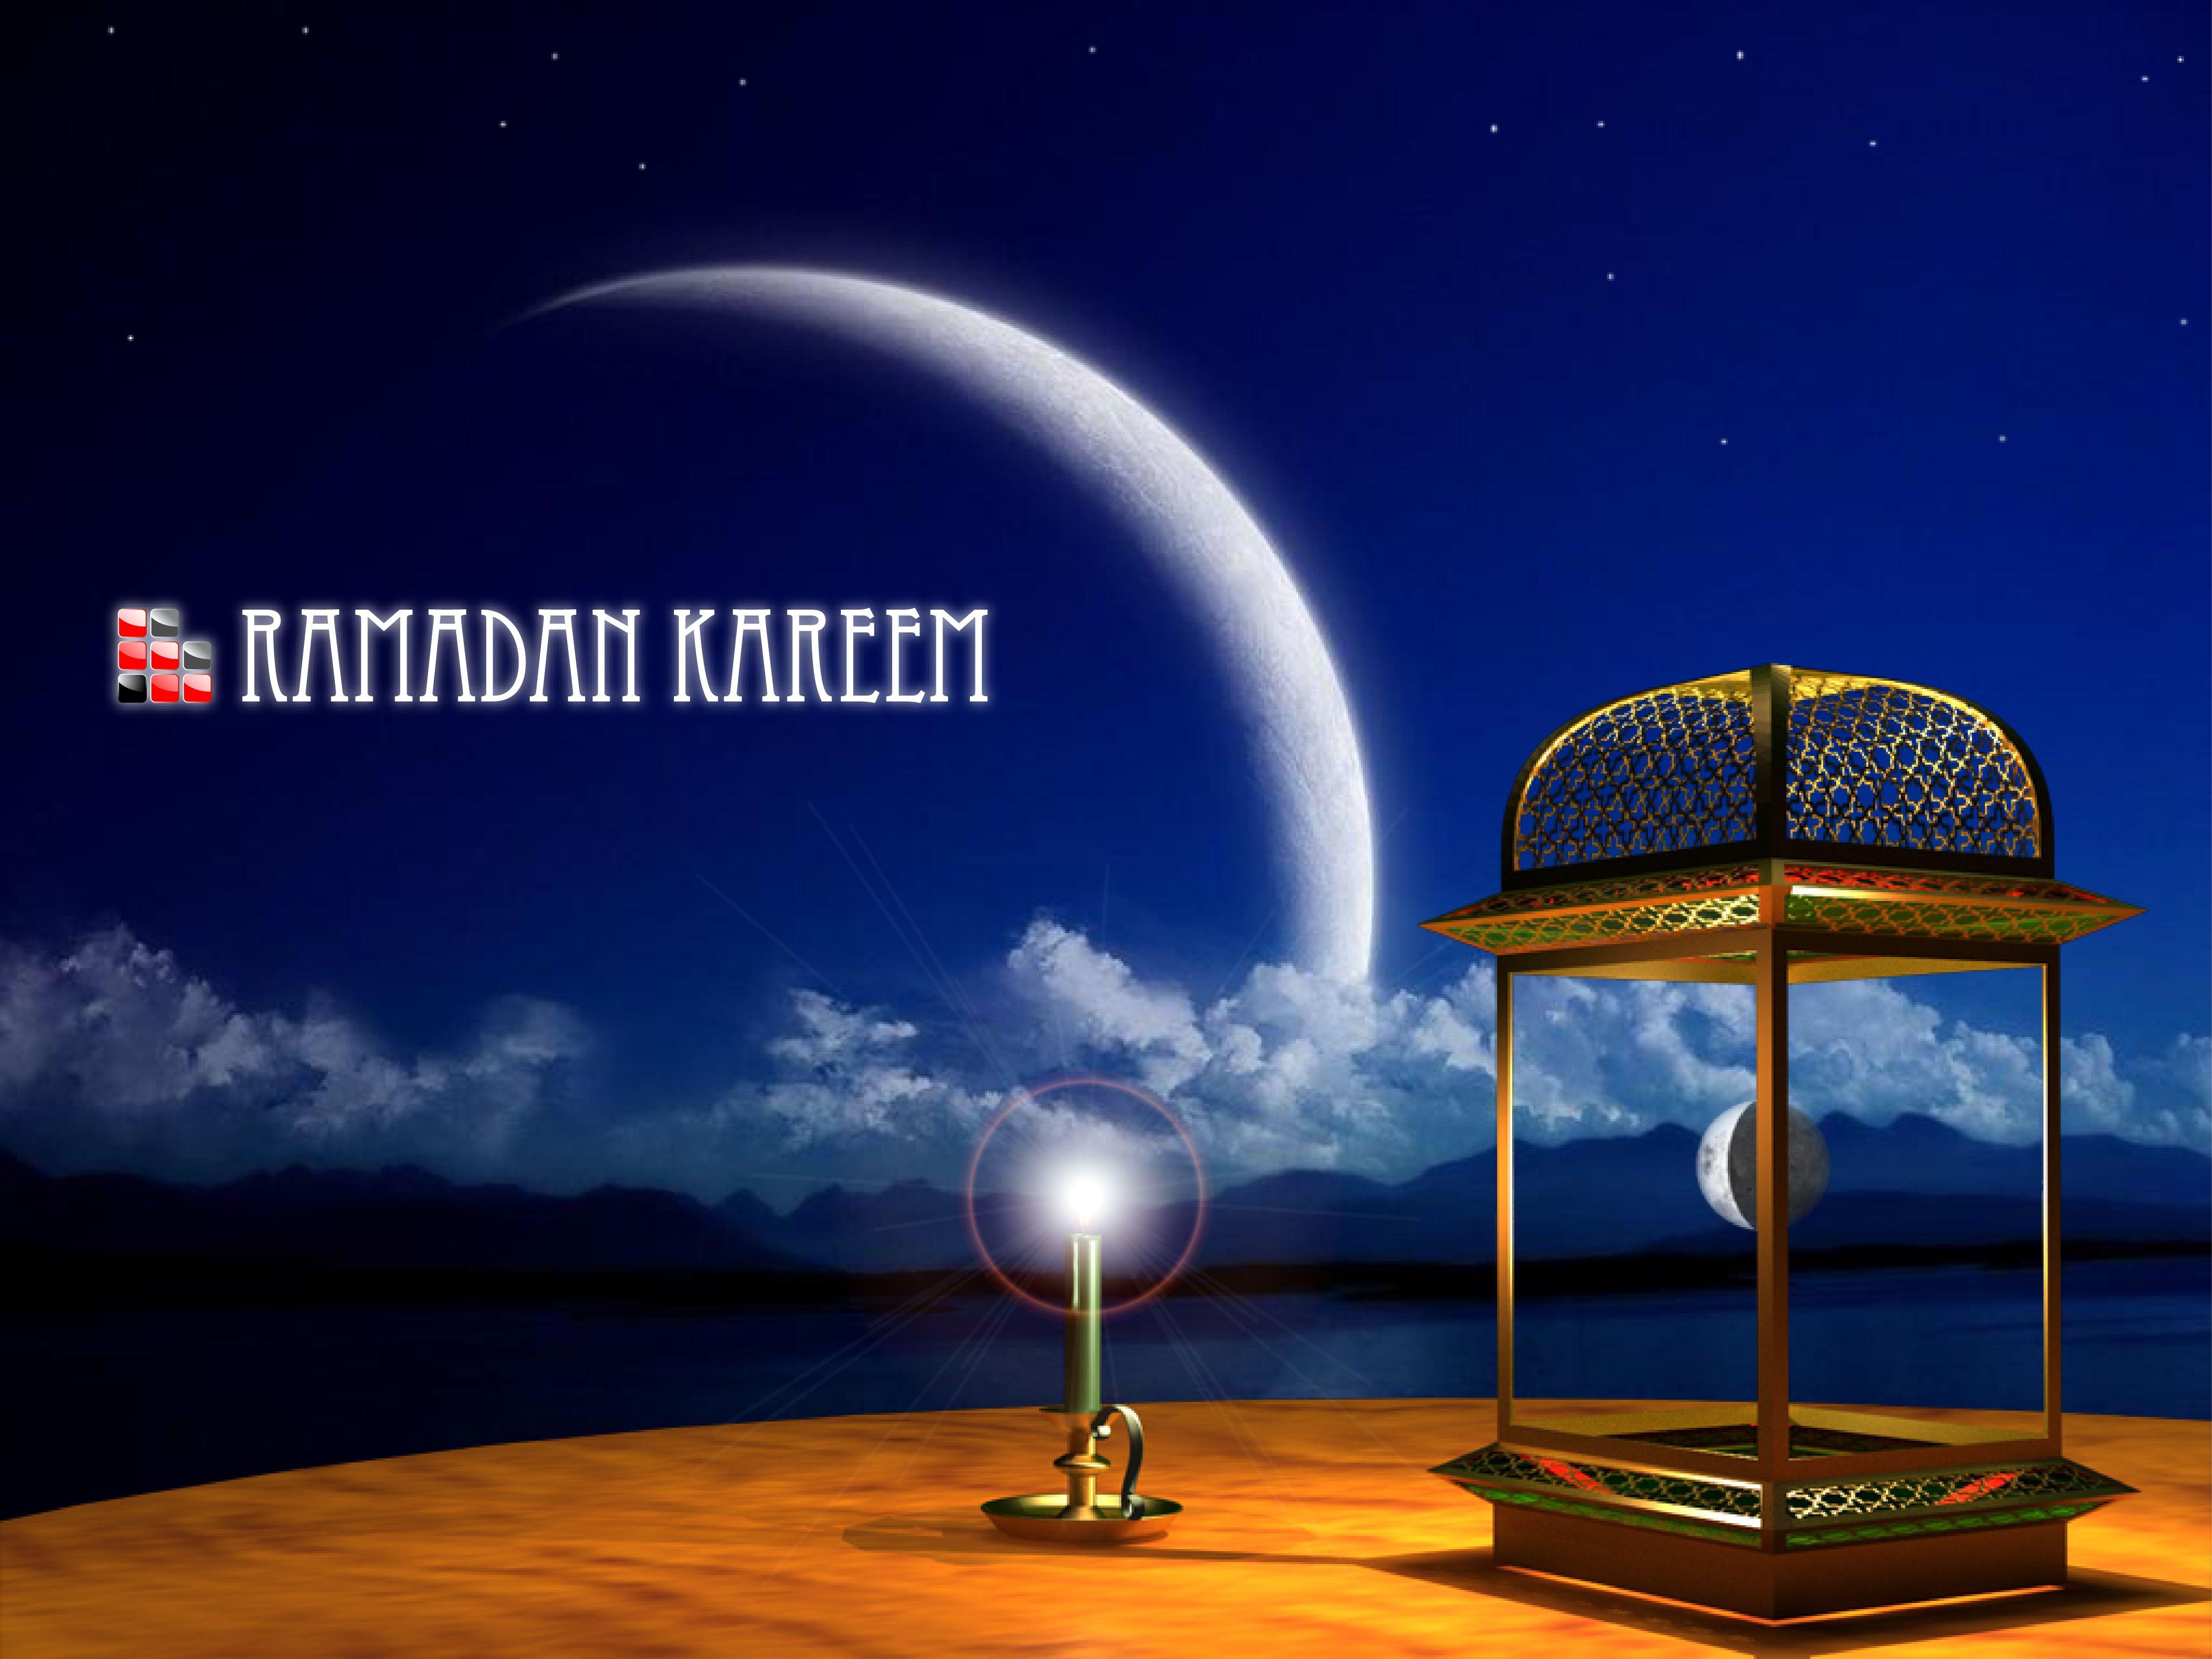 Ramadan2g 42673200 ramadan pinterest ramadan and islam holy candle ramadan wallpapers and images wallpapers pictures kristyandbryce Choice Image